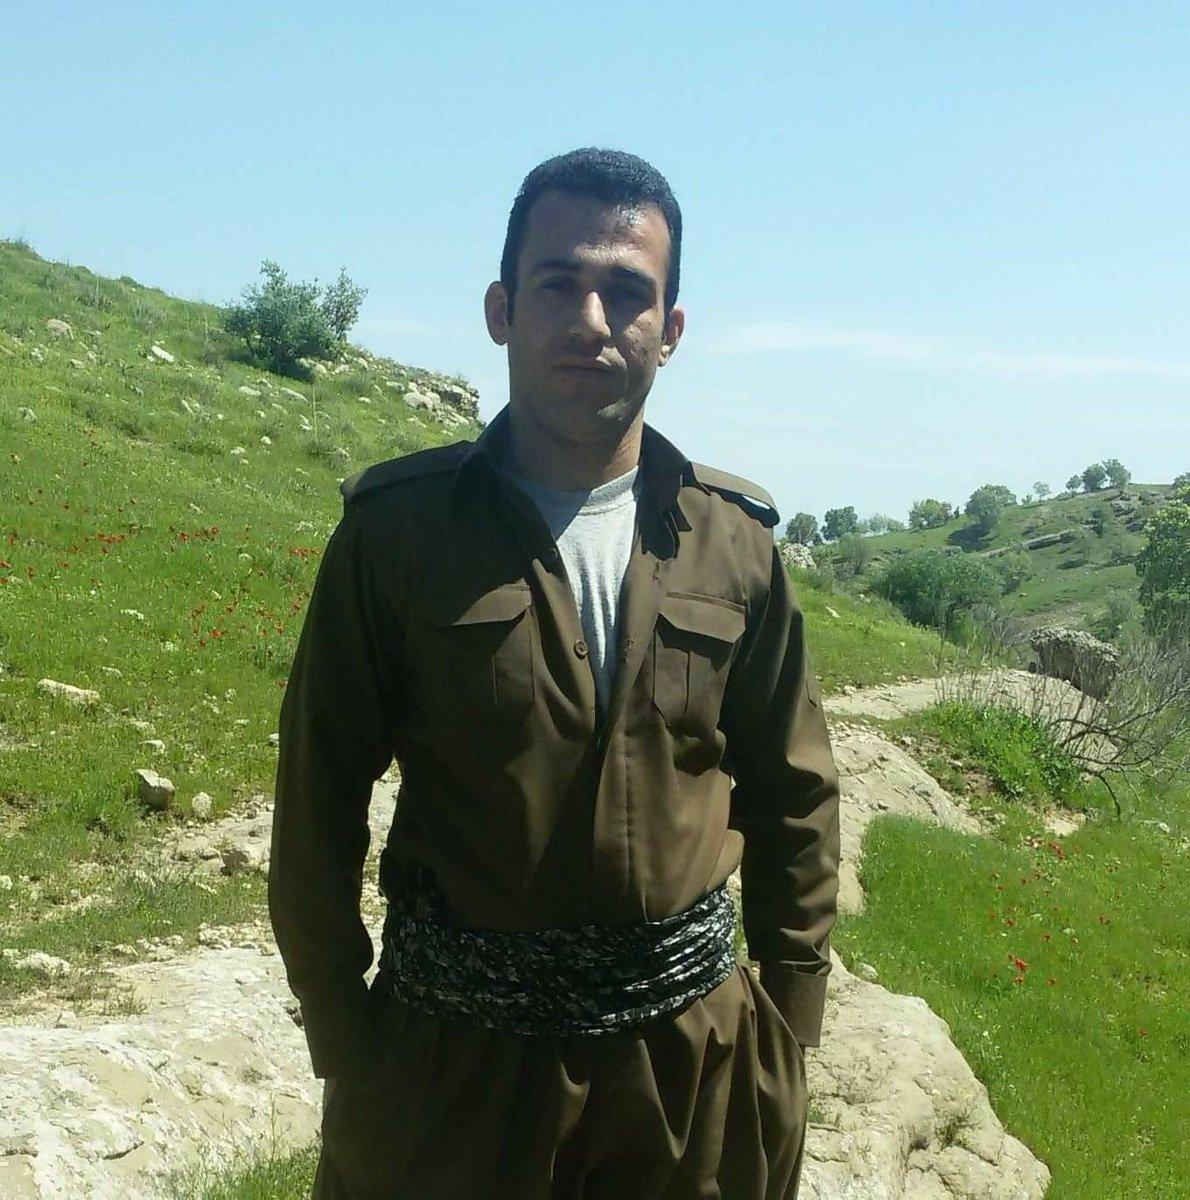 #BREAKING  Ramin &amp; Sabah HosseinPanahi,2 of 3 #Komala party of #Iranian #Kurdistan #Peshmerga,killed in Sanandaj early Friday.Unfortunately<br>http://pic.twitter.com/Fct4vlemS4